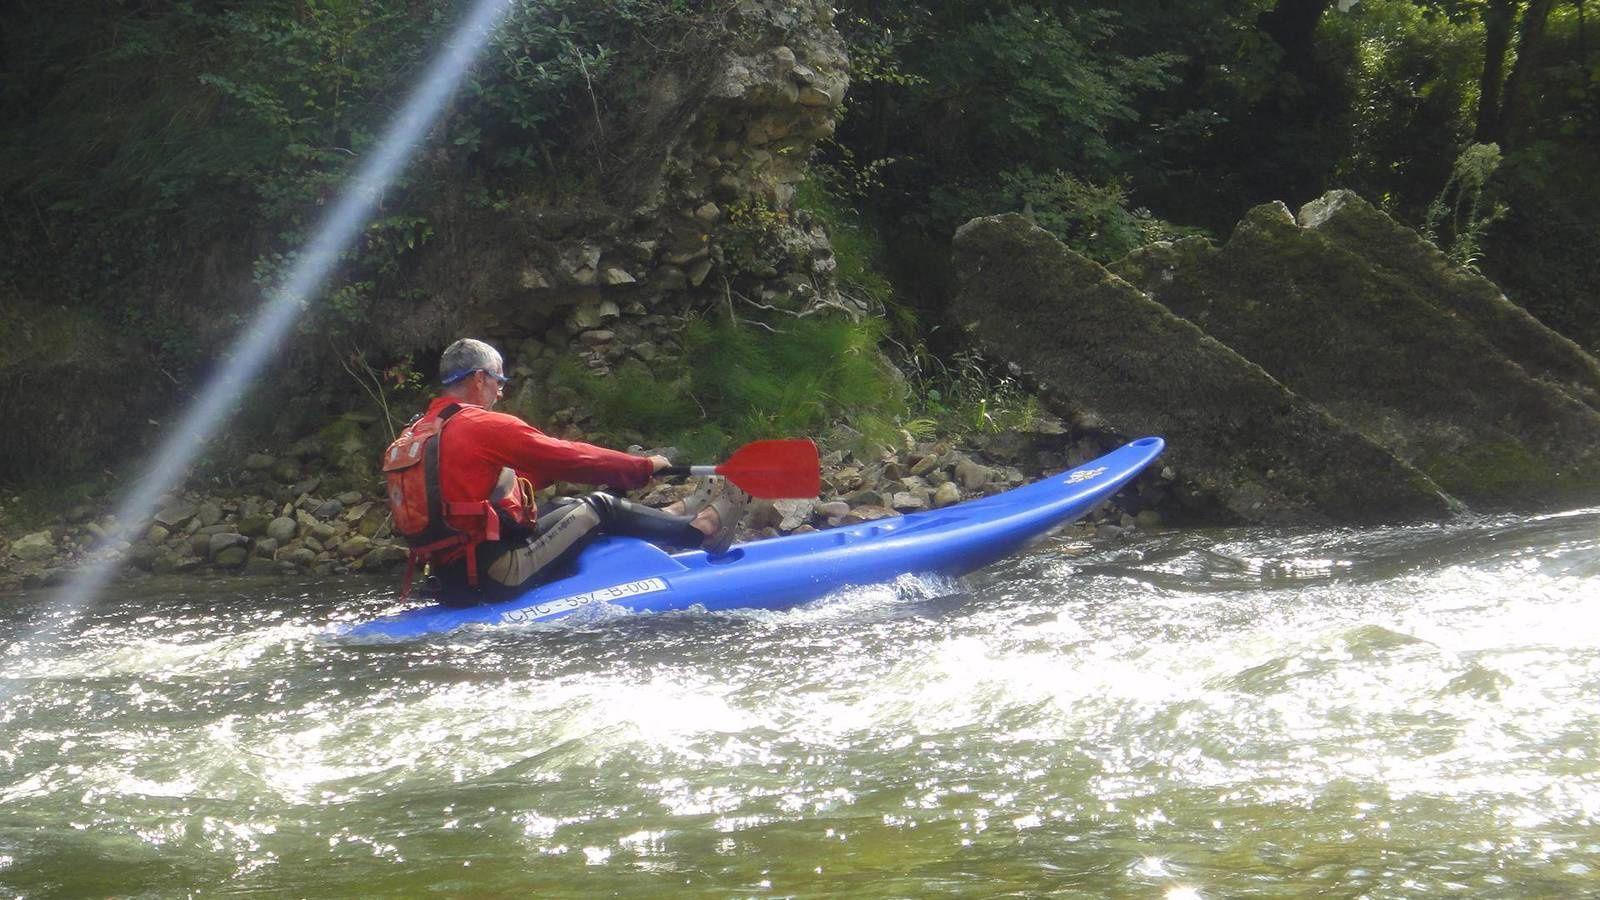 Asturies 2015 : de Arriondas à Ribadesella, descente du Rio Sella